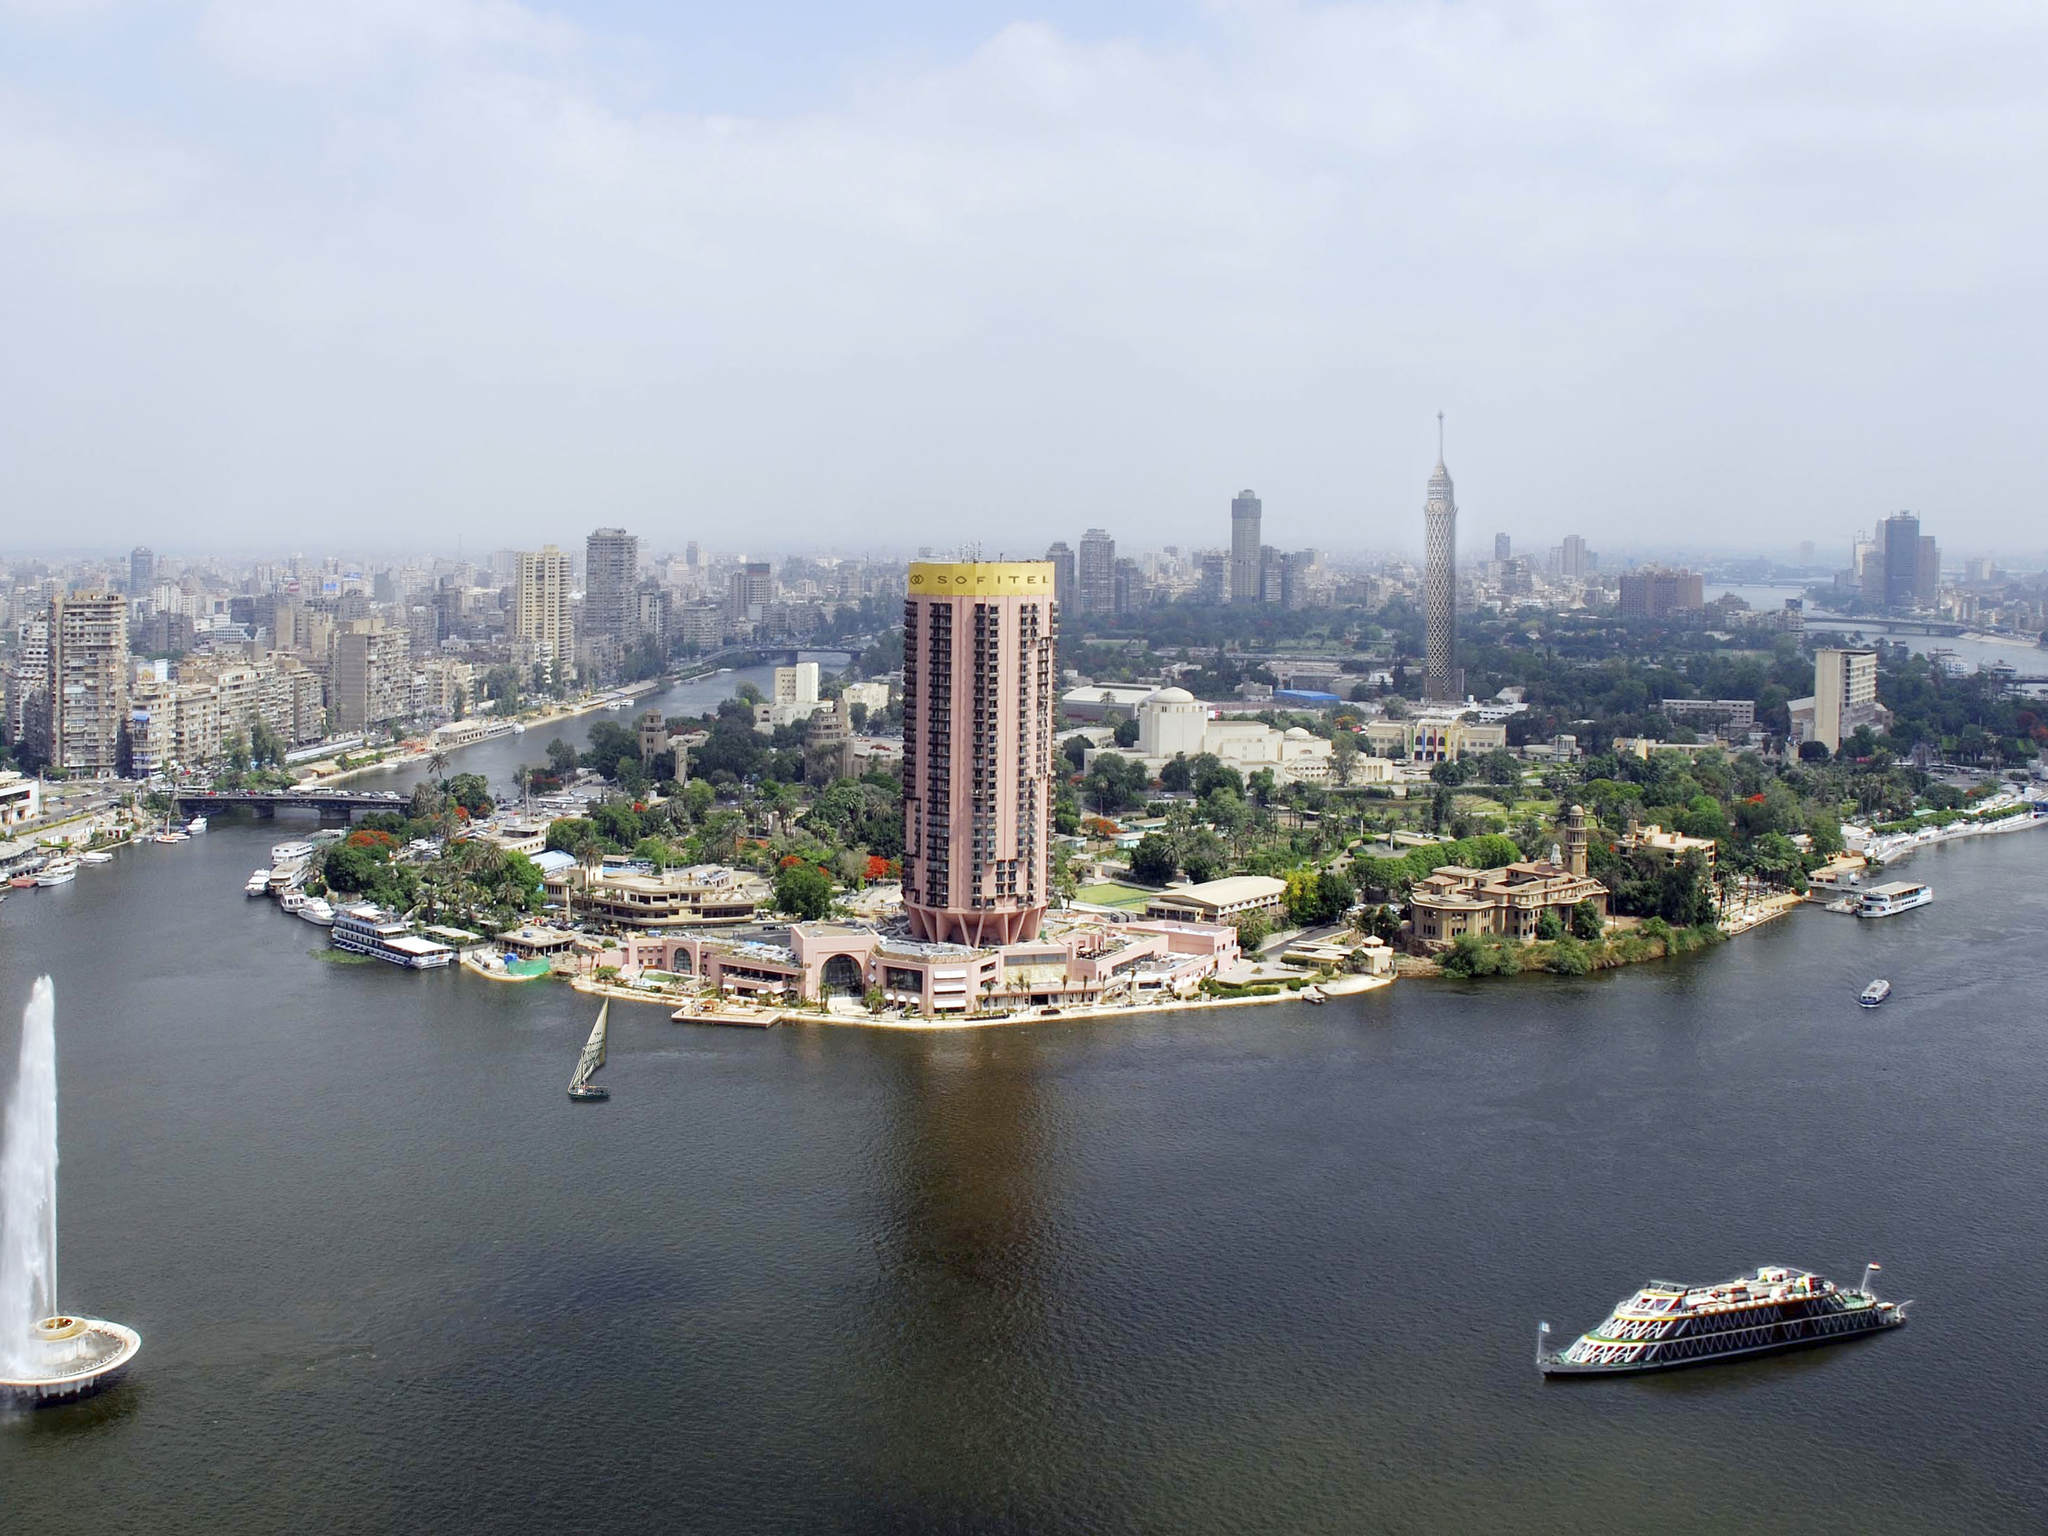 Hotel - Sofitel Cairo Nile El Gezirah